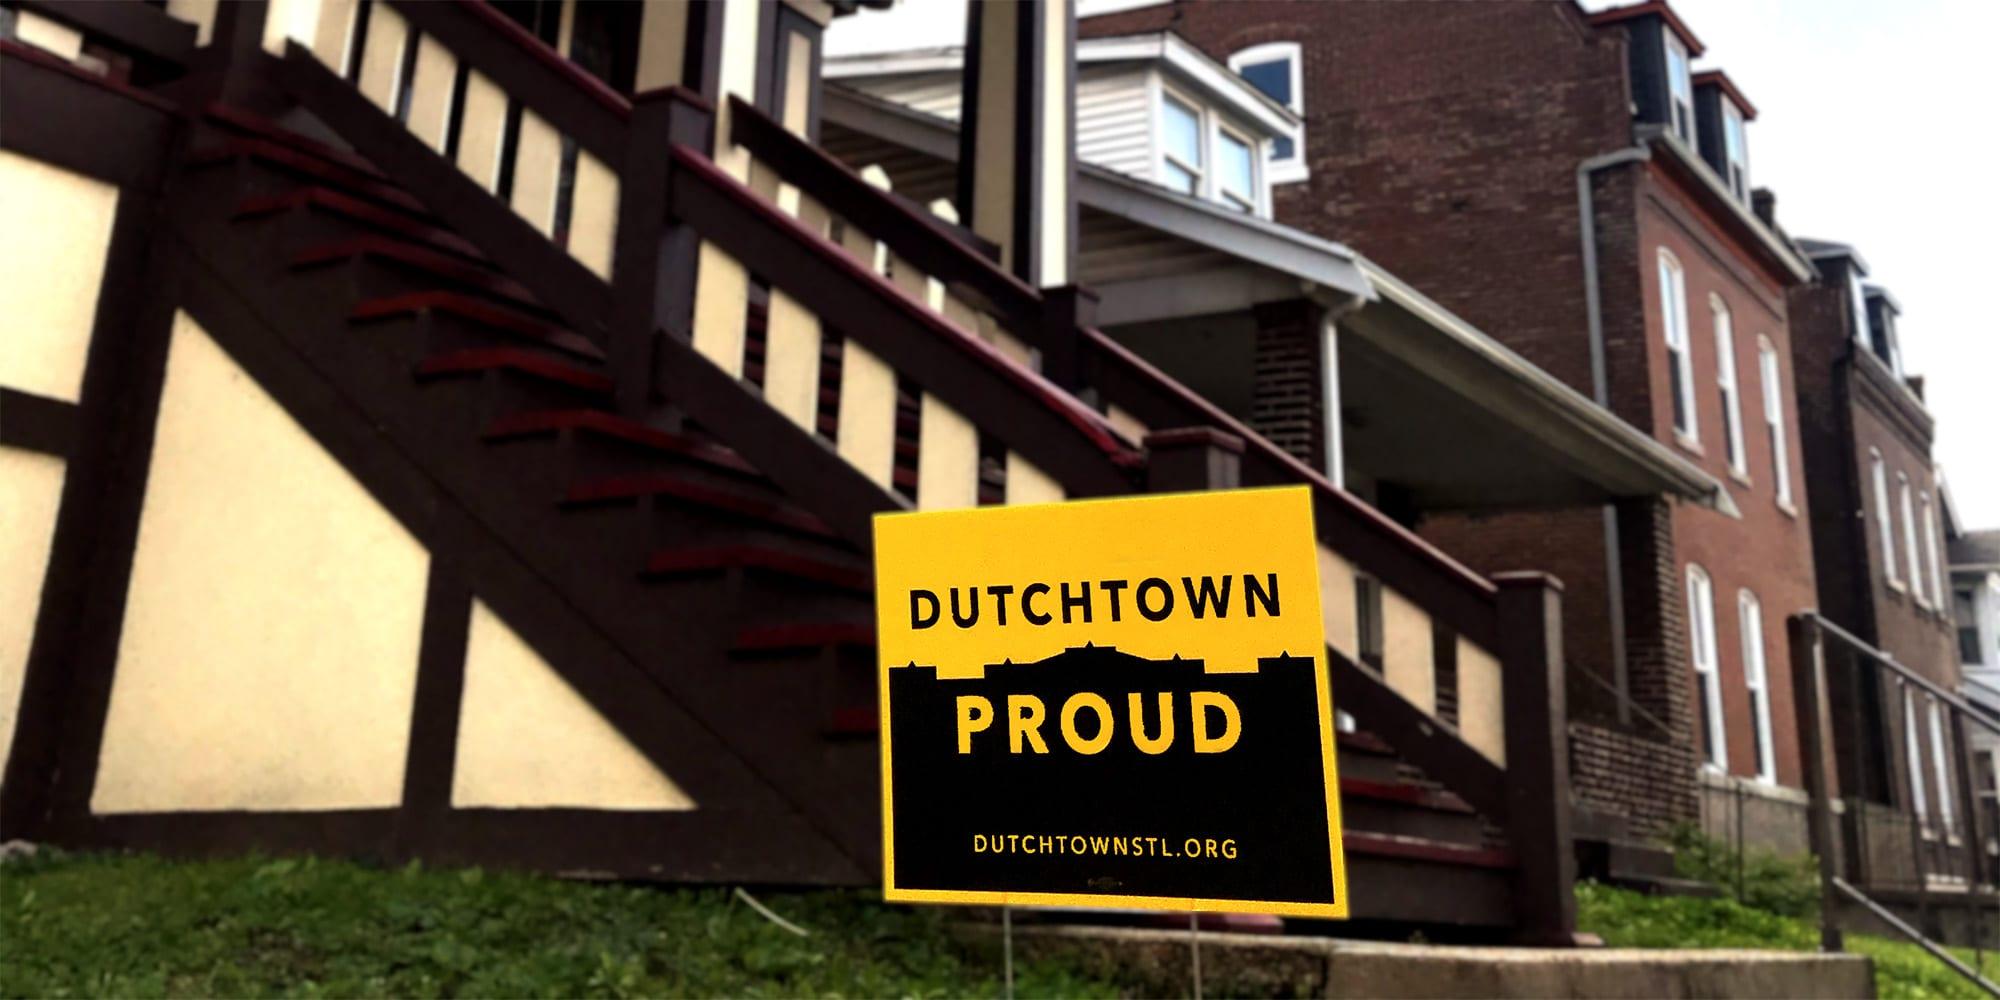 Dutchtown Proud yard sign.